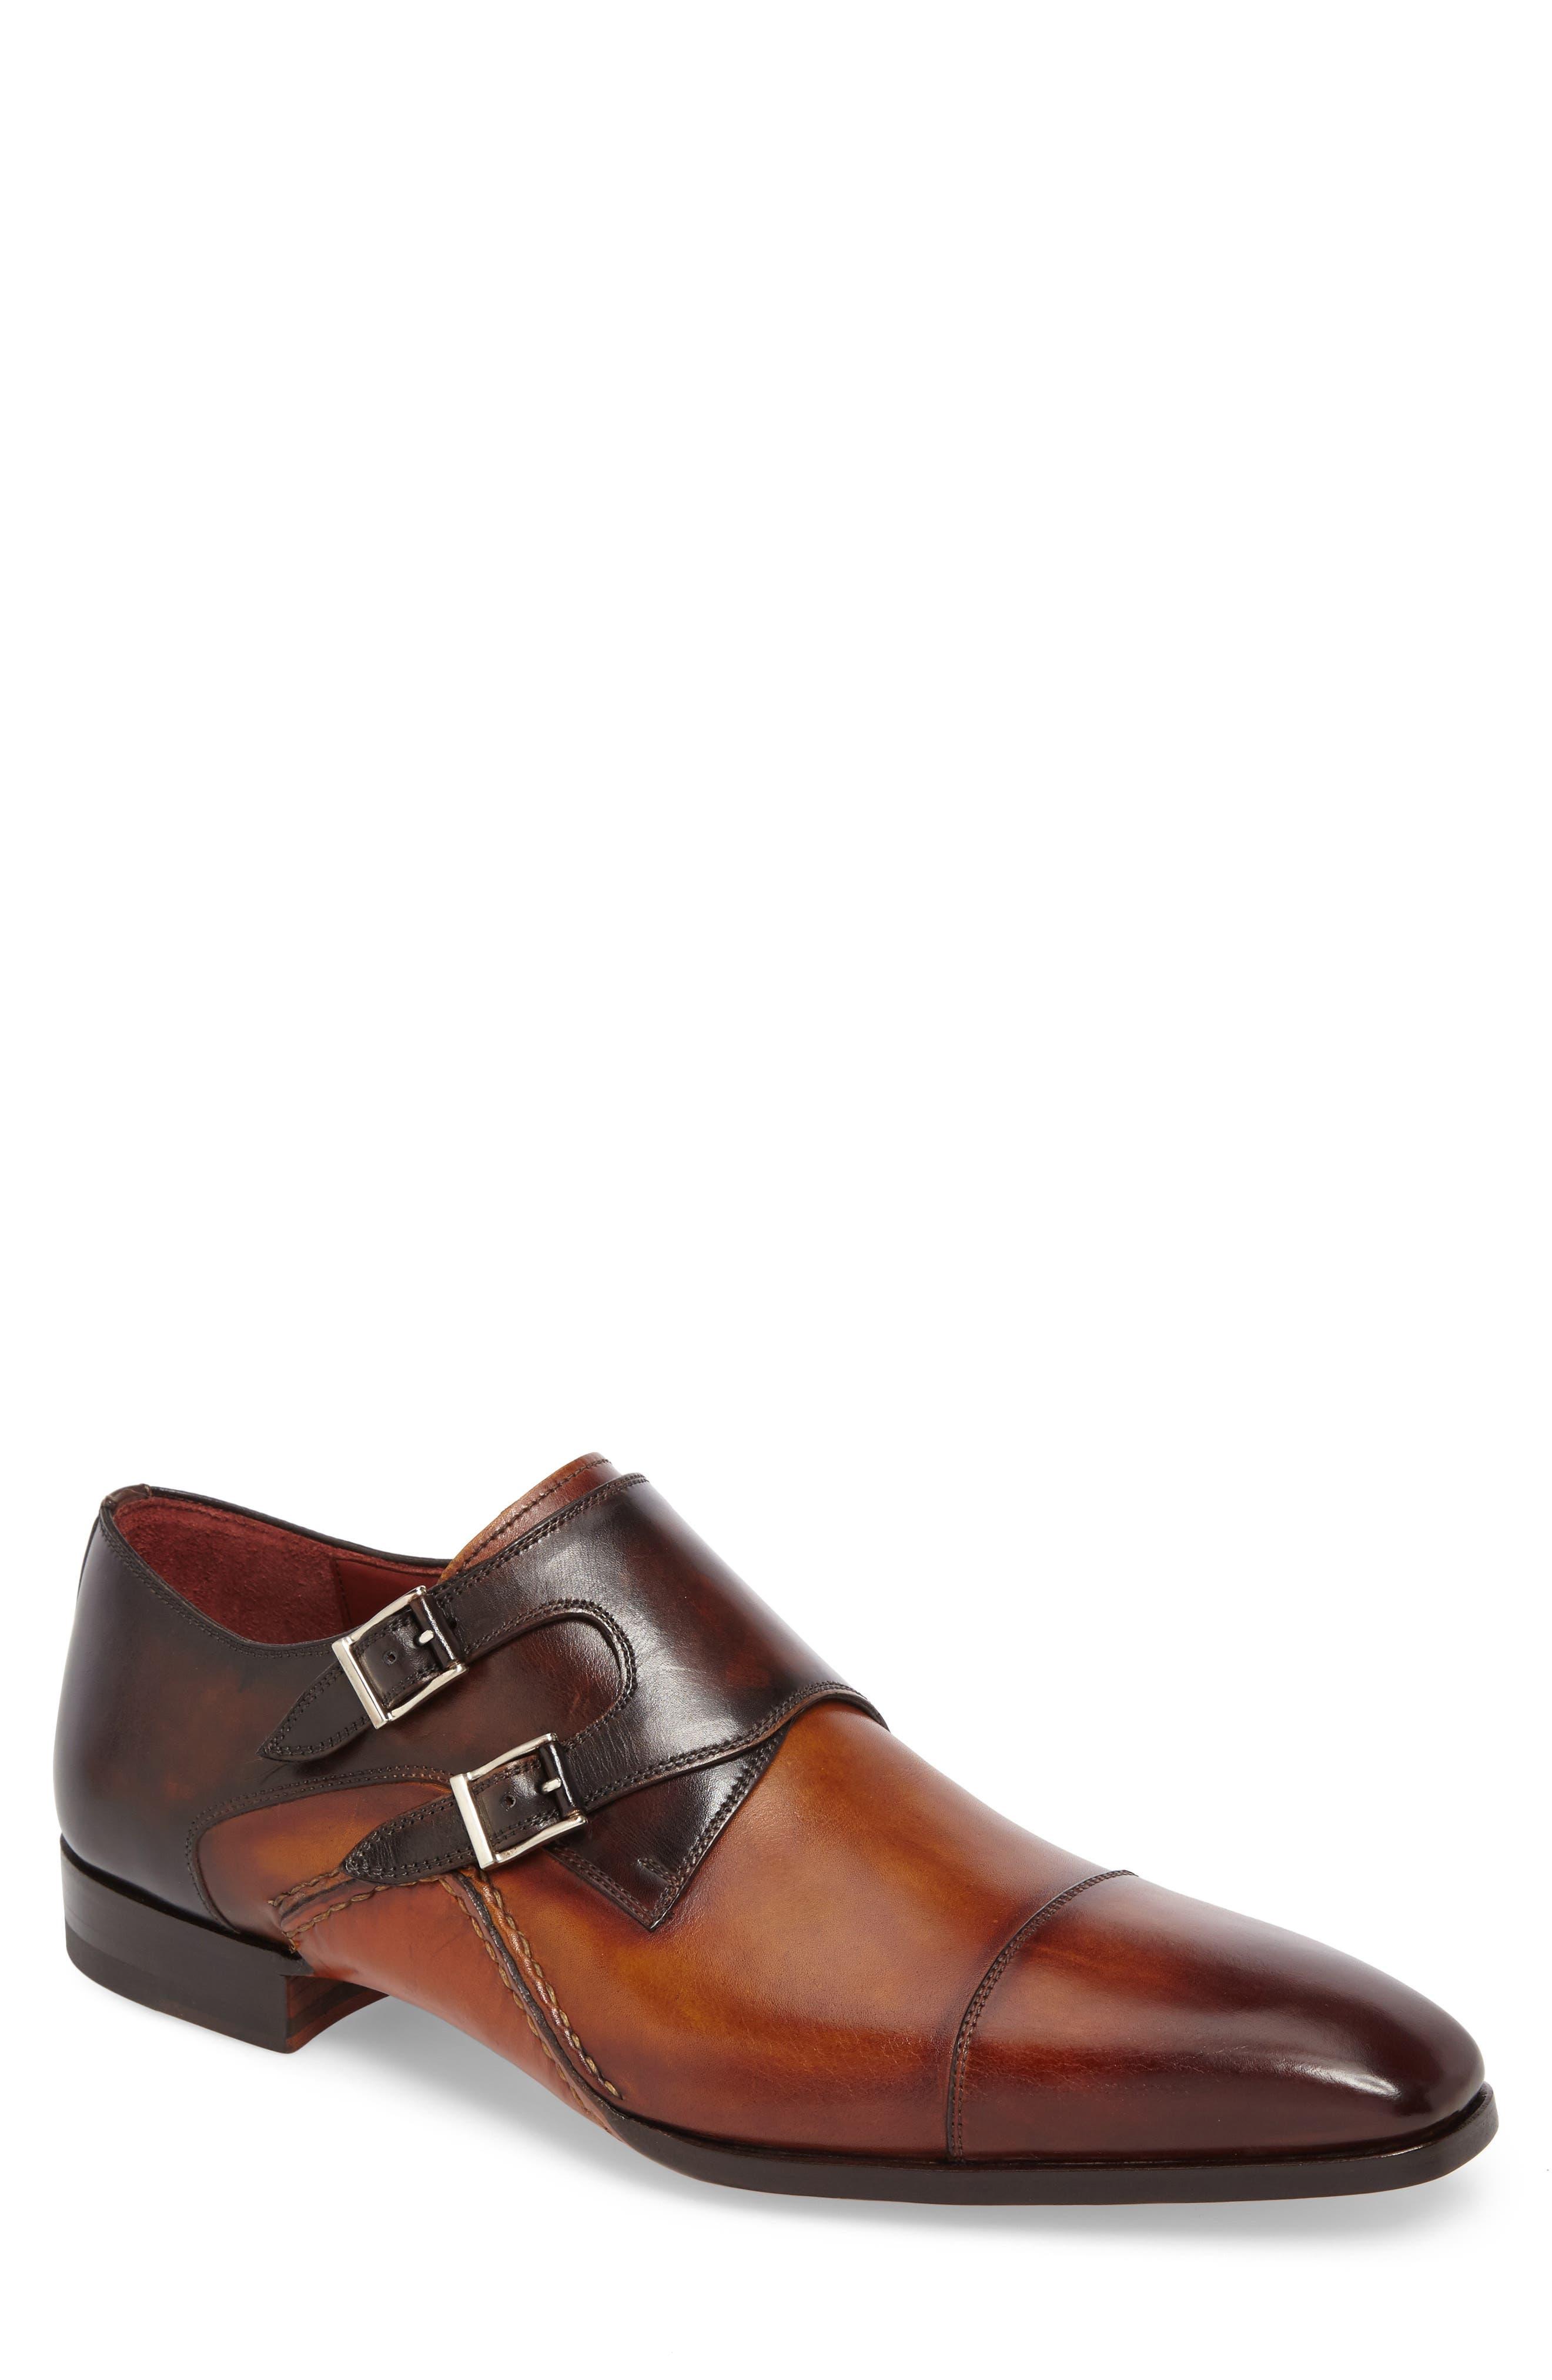 MAGNANNI Ondara Double Monk Strap Shoe, Main, color, CUERO/ BROWN LEATHER